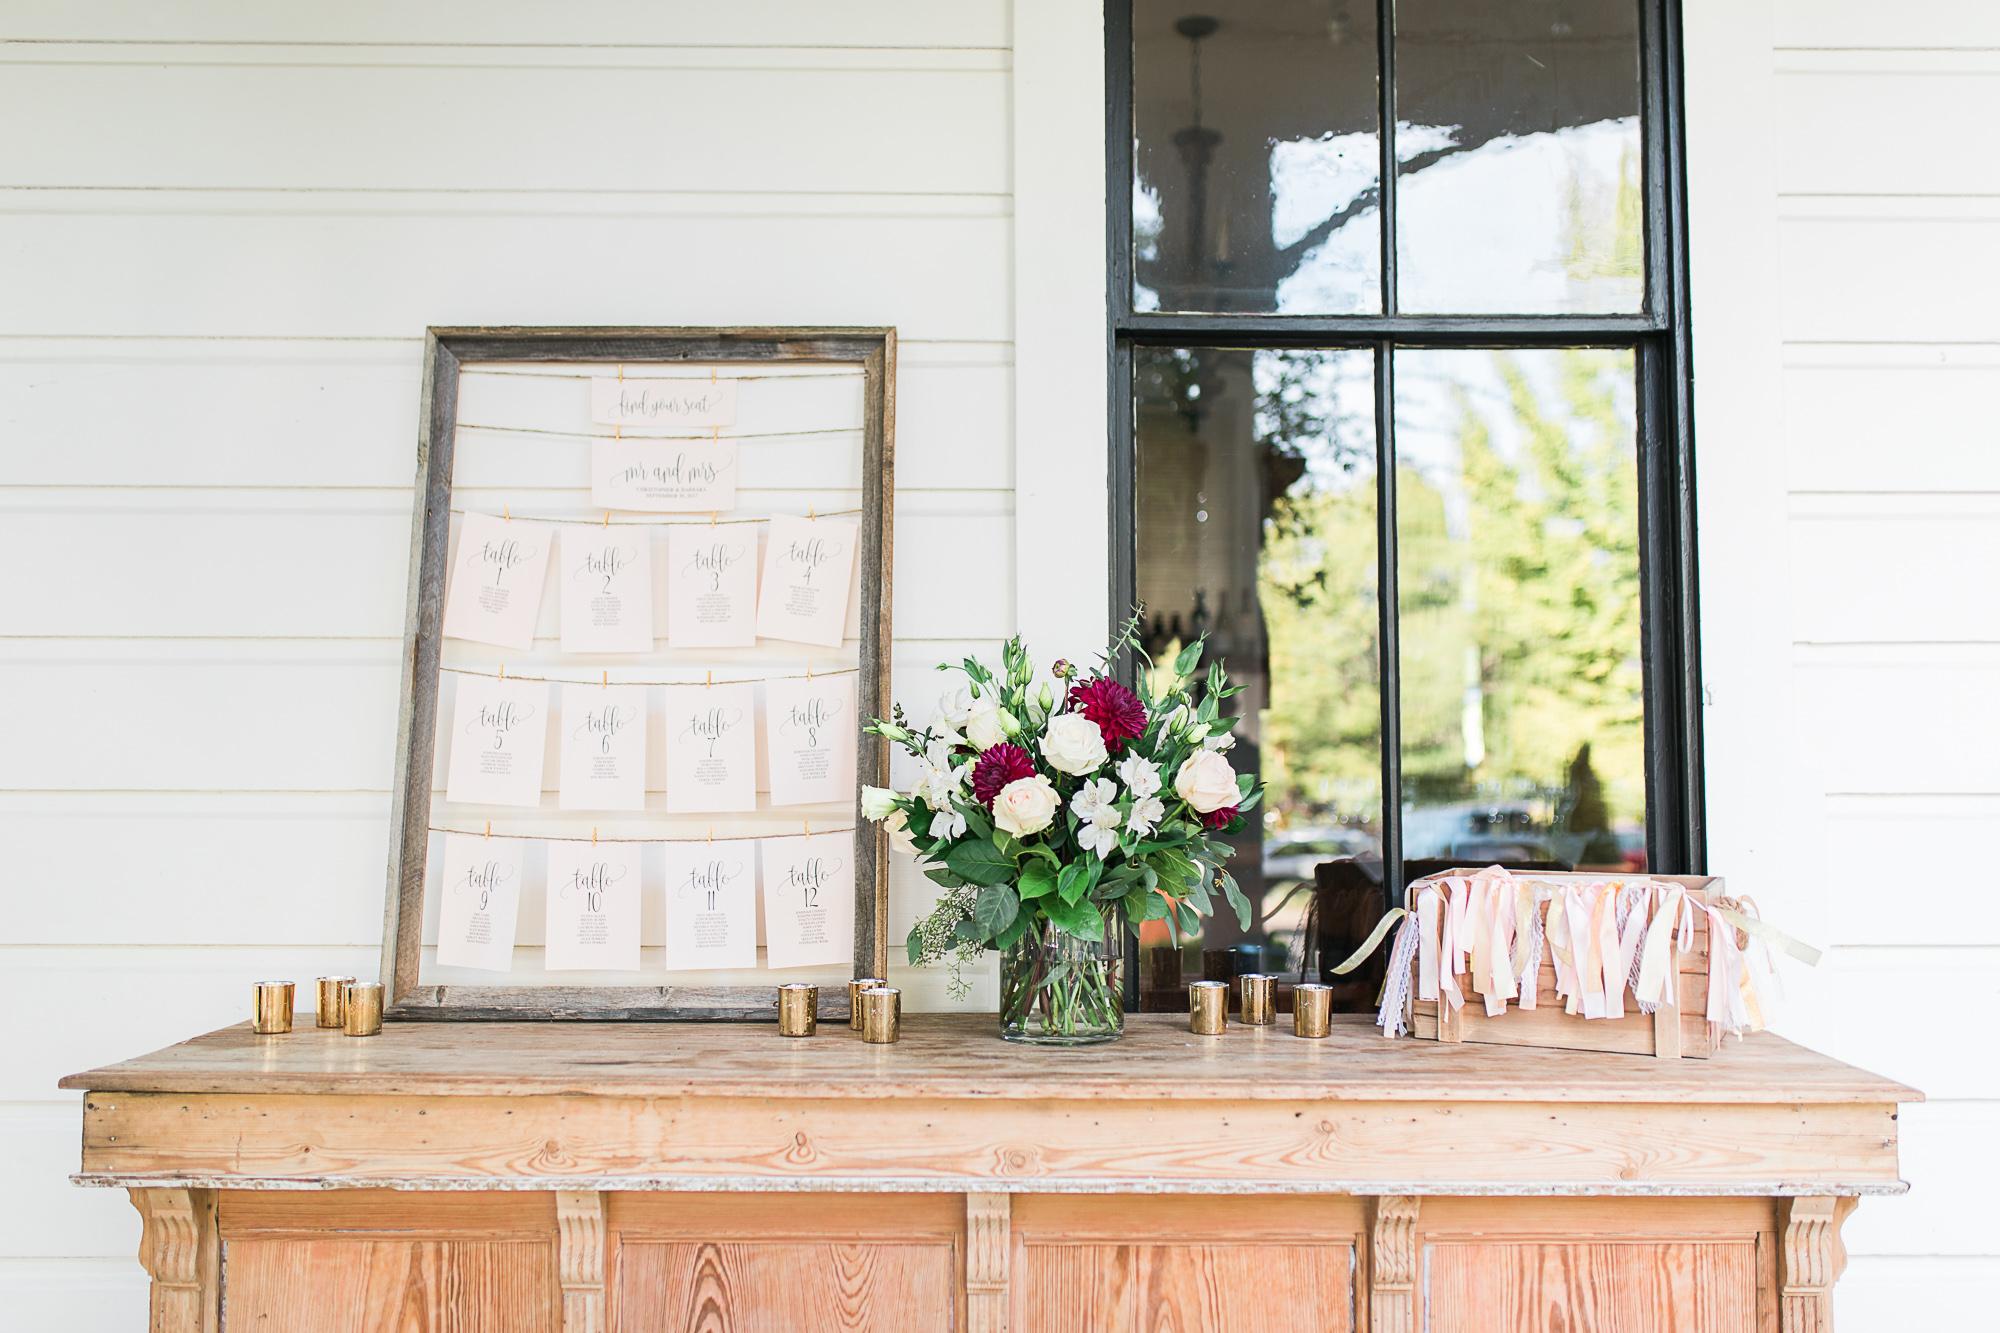 Generals Daughter Wedding Photos by JBJ Pictures - Ramekins Wedding Venue Photographer in Sonoma, Napa (21).jpg